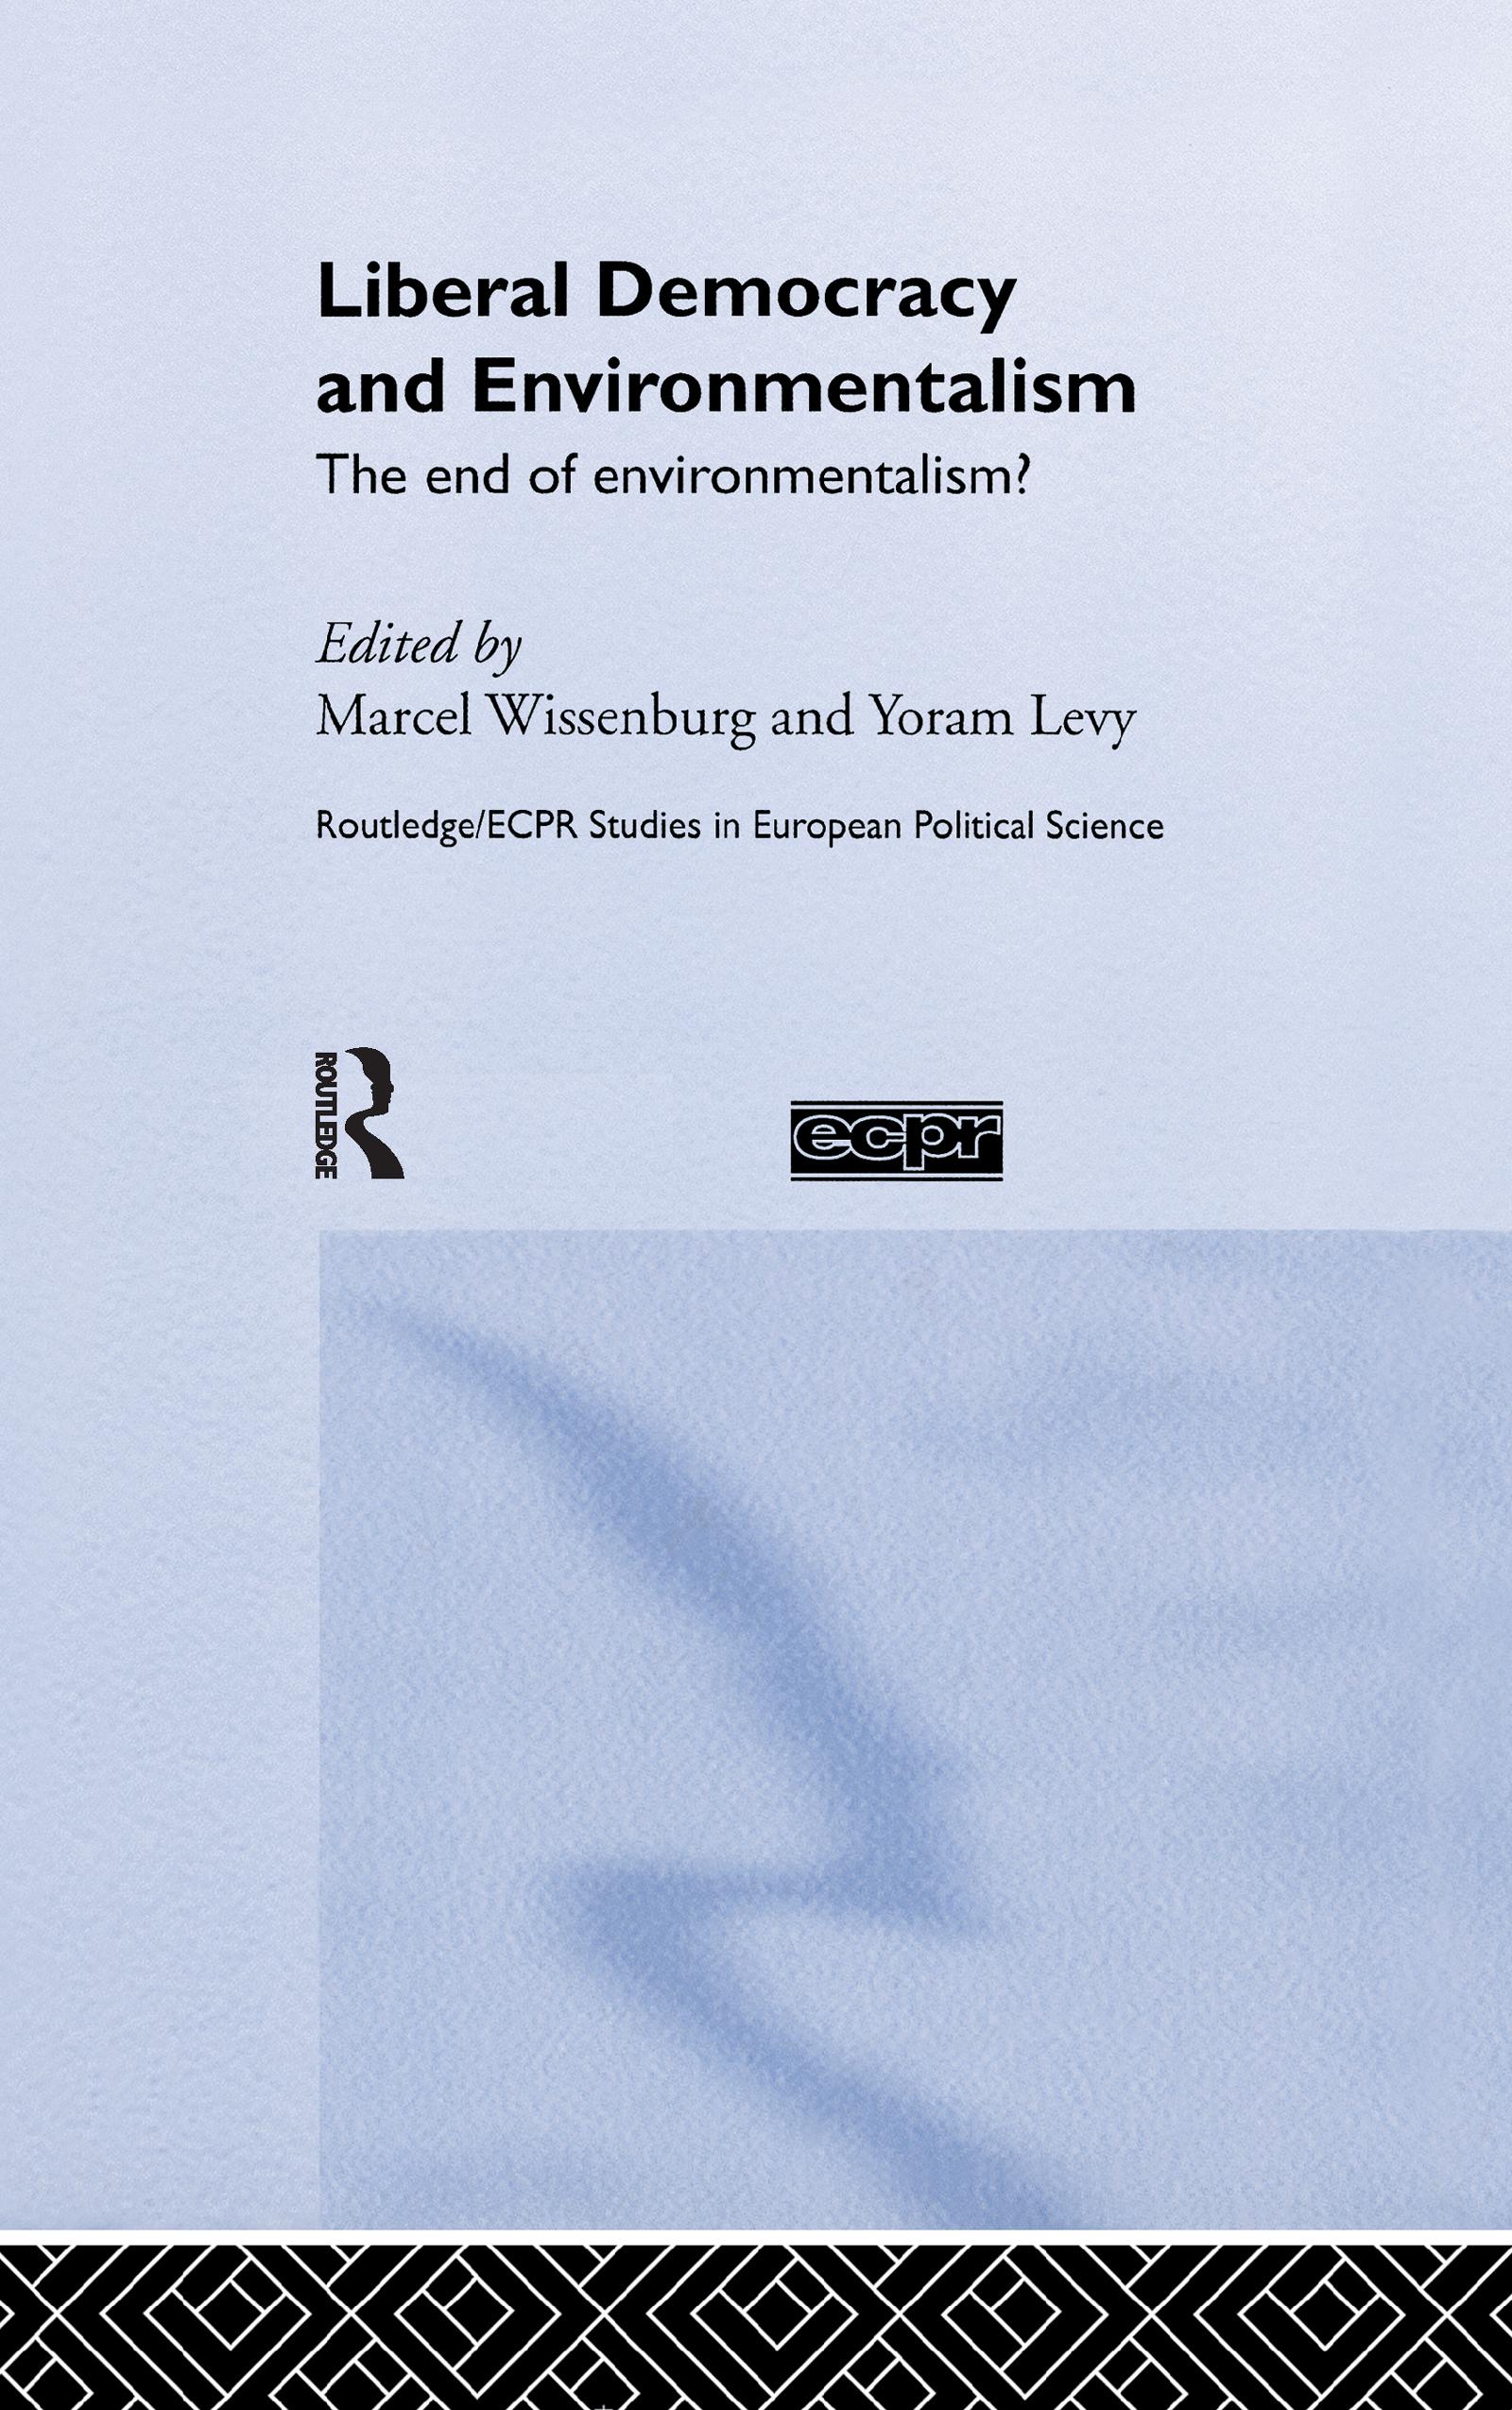 Liberal Democracy and Environmentalism